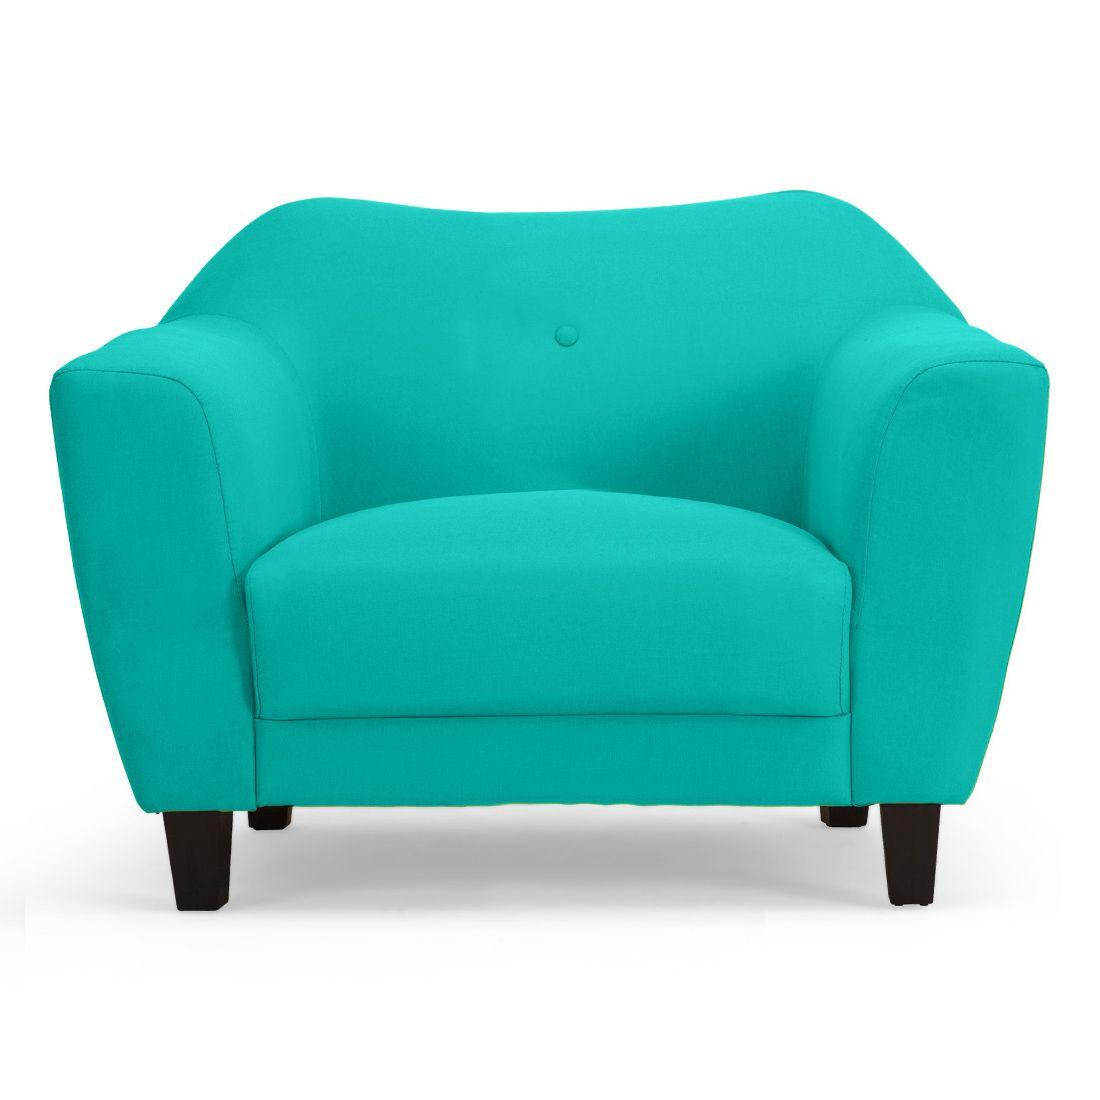 armchairs uk | uk armchairs | armchairs | armchairs cheap ...